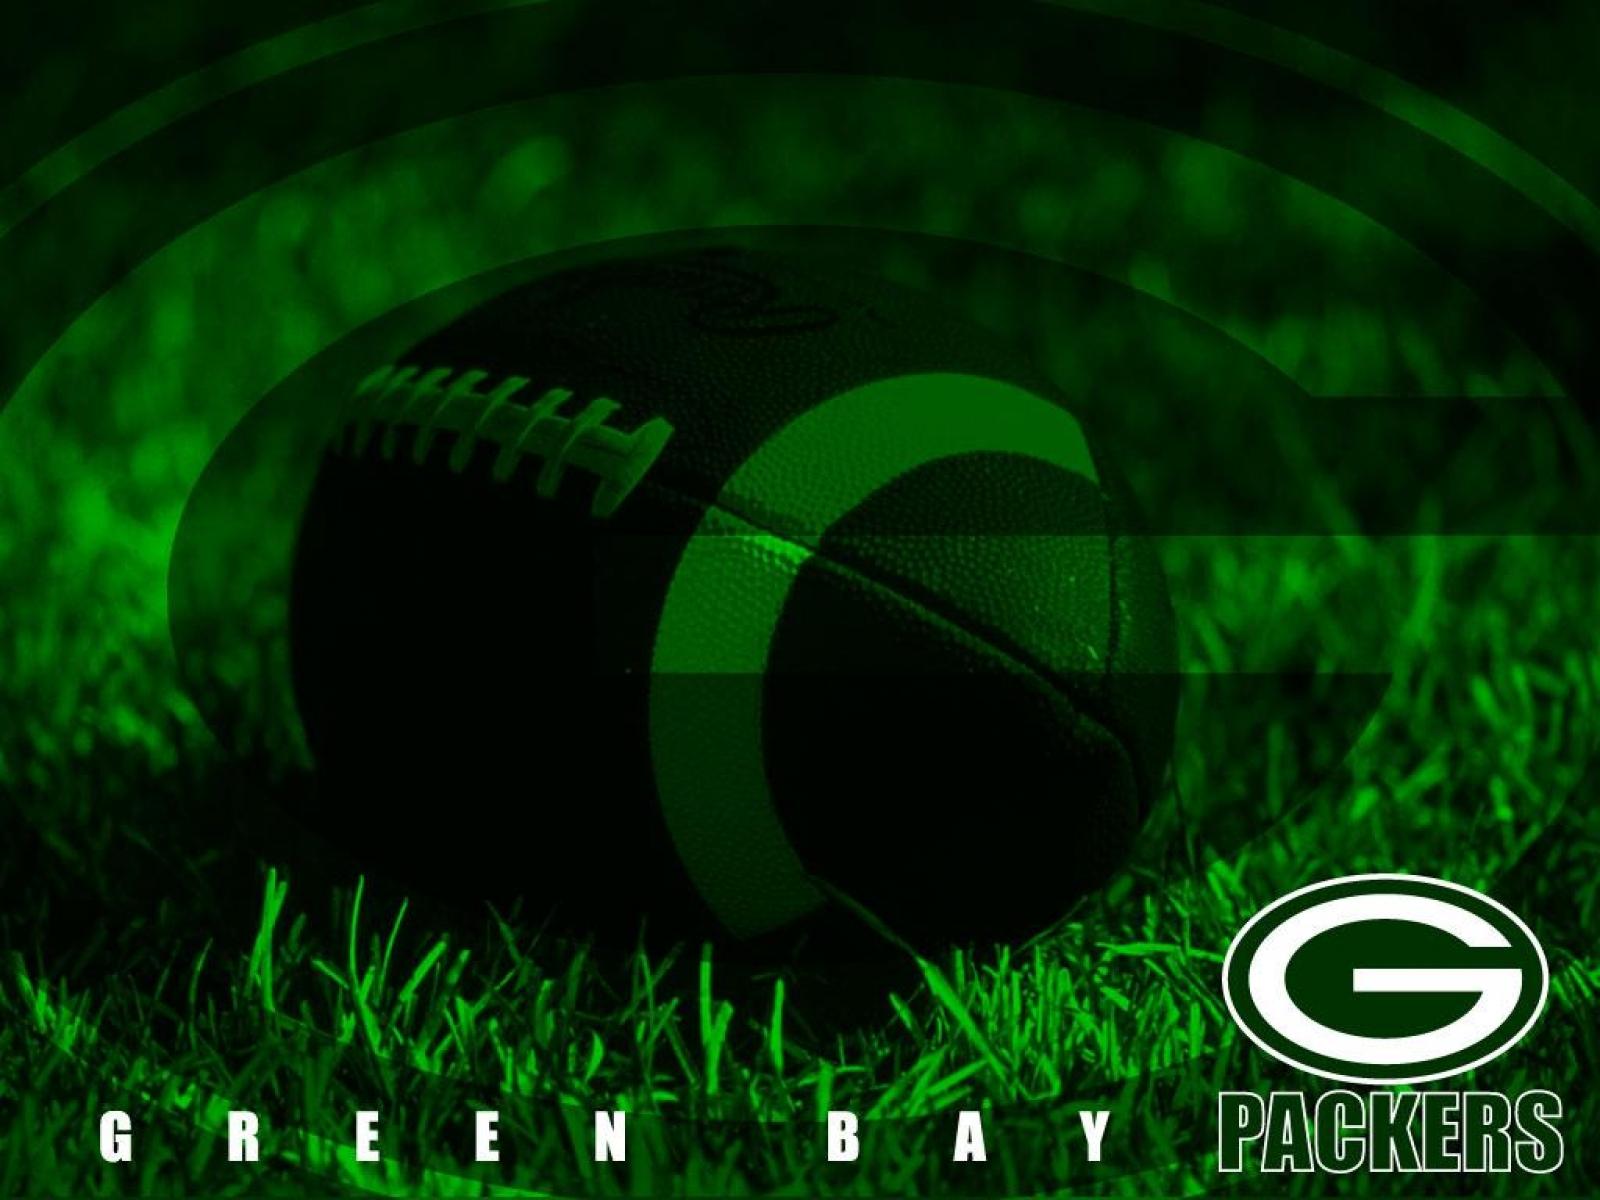 GREEN BAY PACKERS Nfl Football Rm Wallpaper